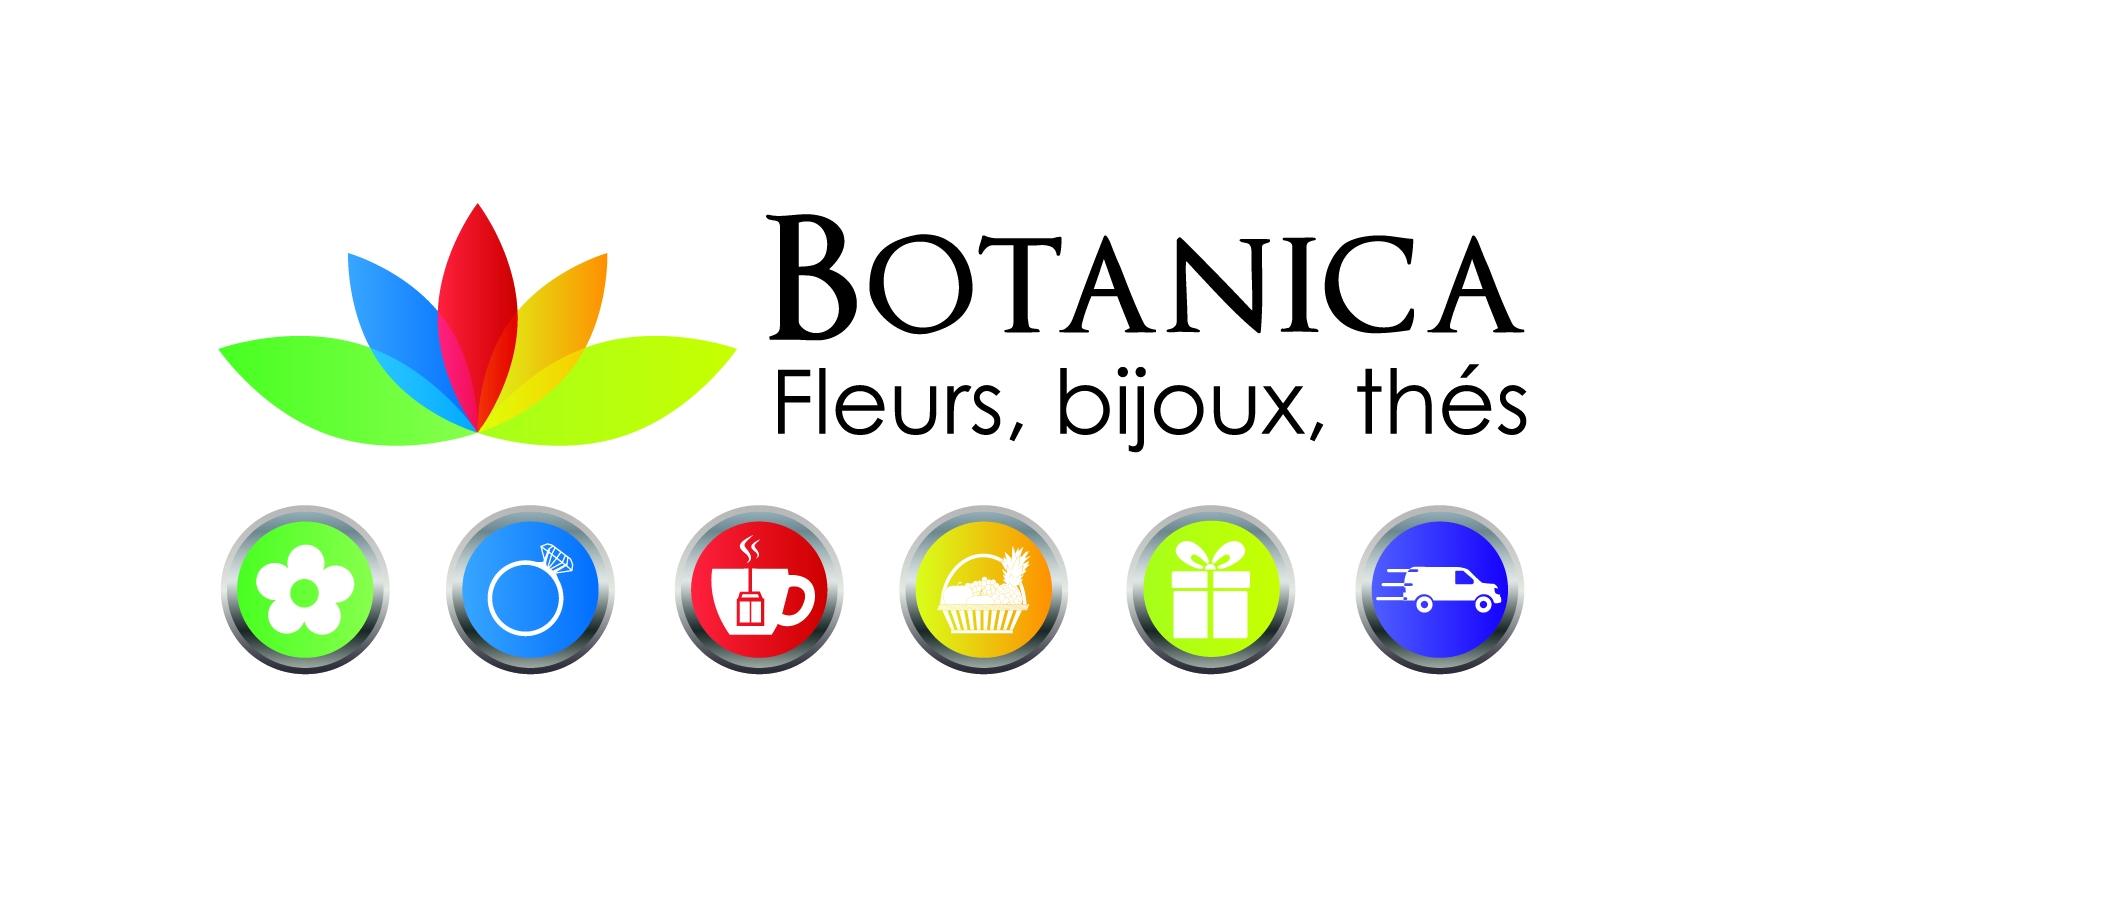 Botanica Fleurs Bijoux Thes Horizonal Icone